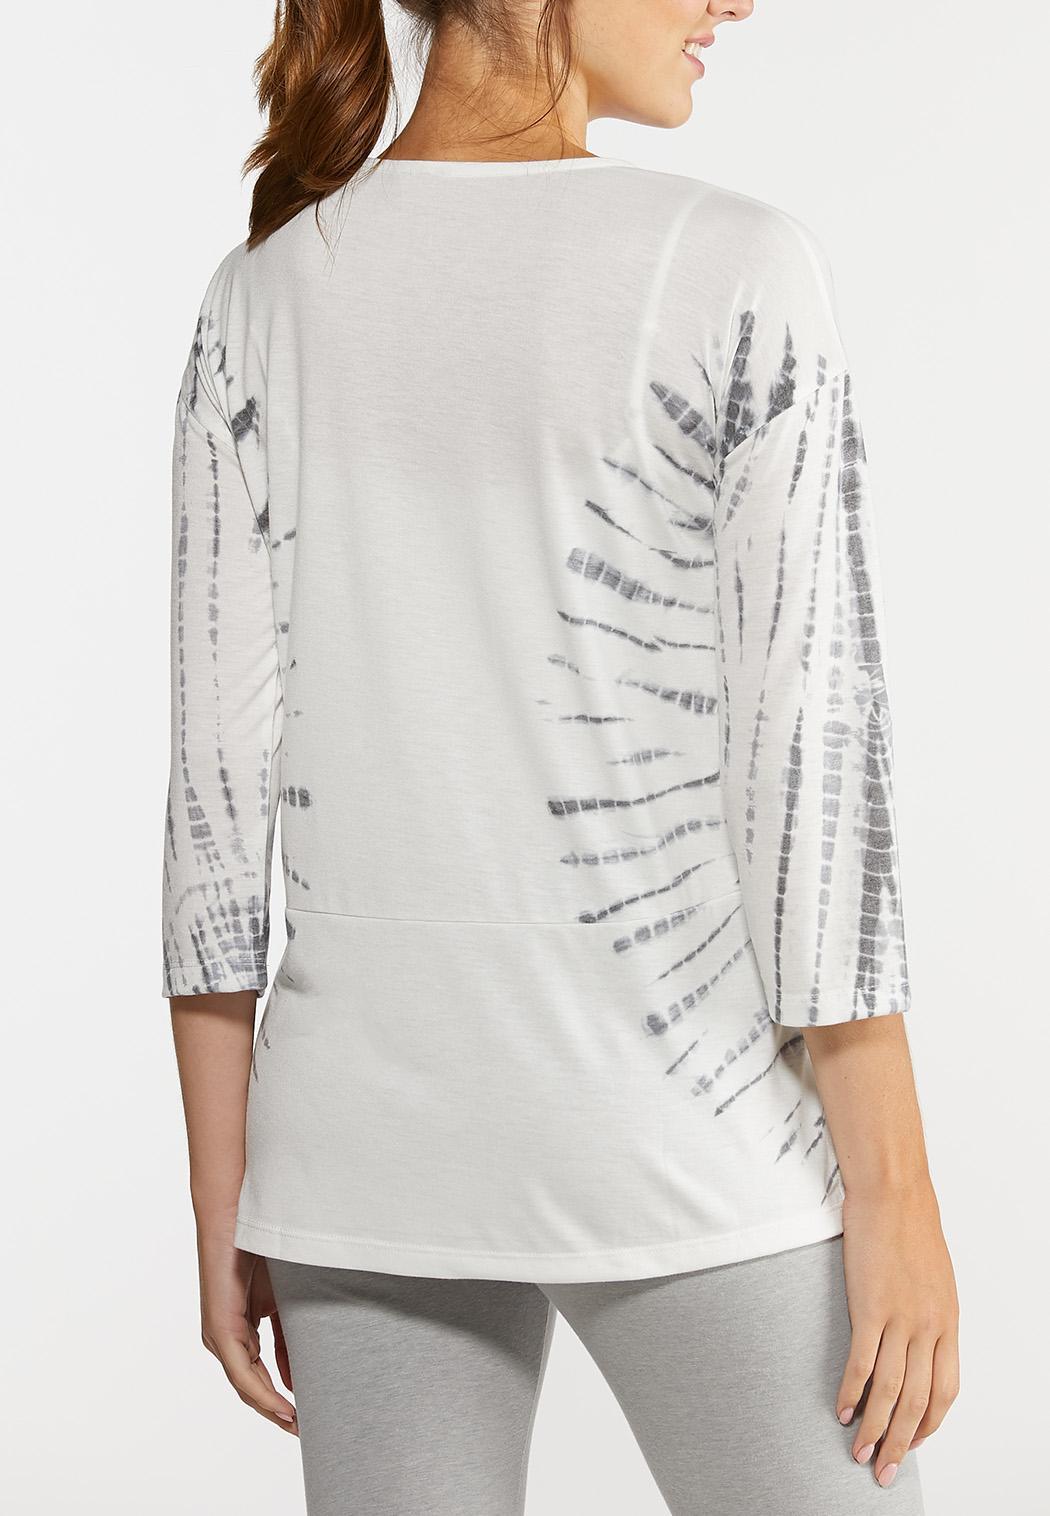 Plus Size Tie Dye Elbow Sleeve Top (Item #44300111)